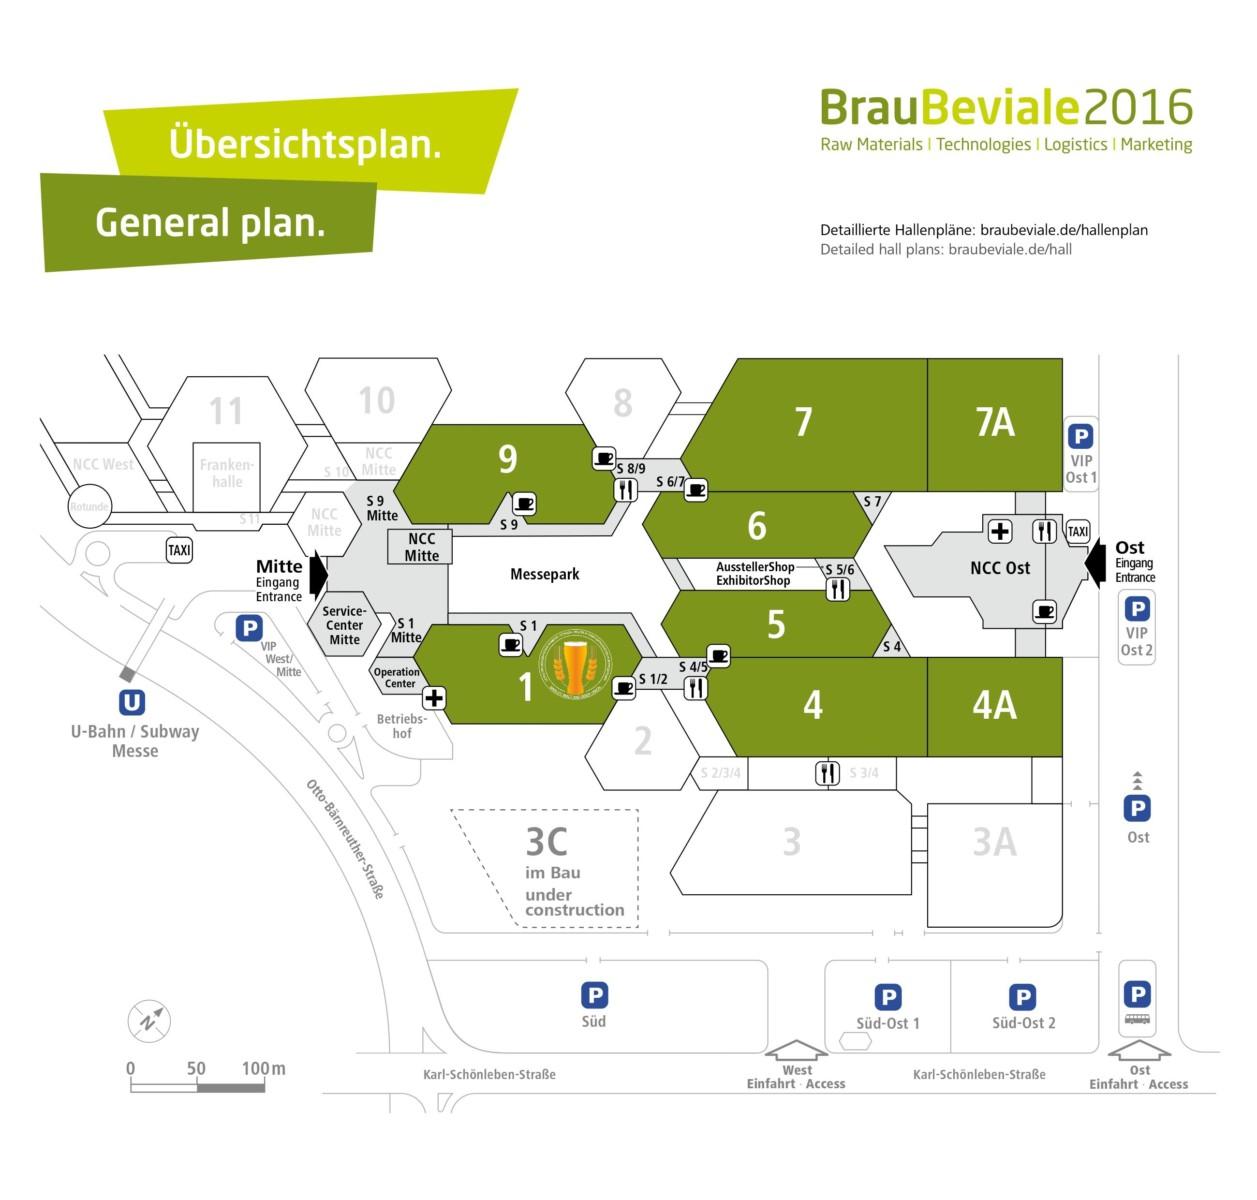 BrauBeviale 2016 Hallenplan + bmbu